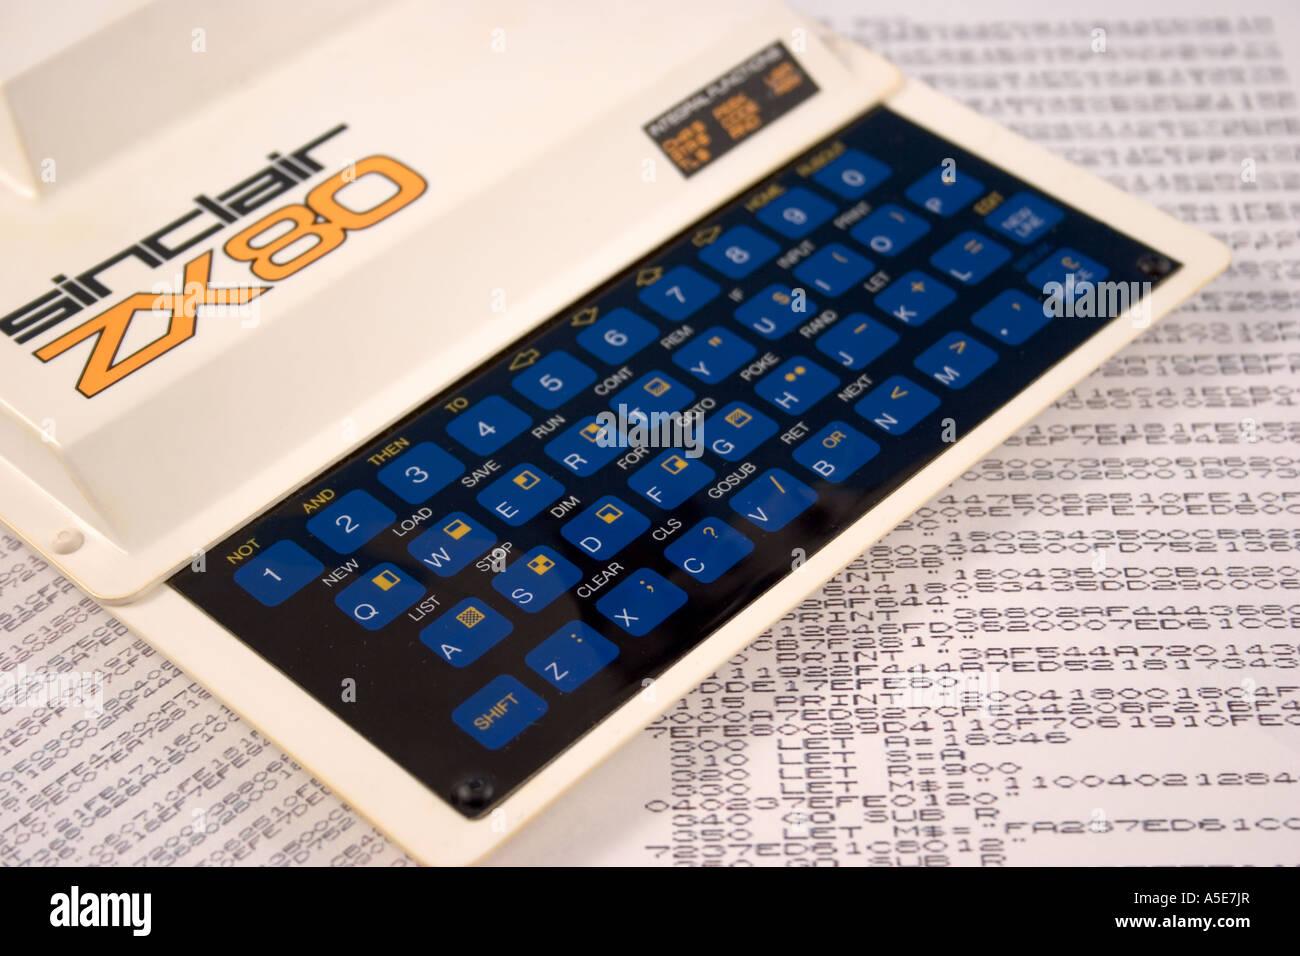 Programming Language Basic Stock Photos Zx80 Circuit Diagram Sinclair Home Computer On Printout Of Code Image